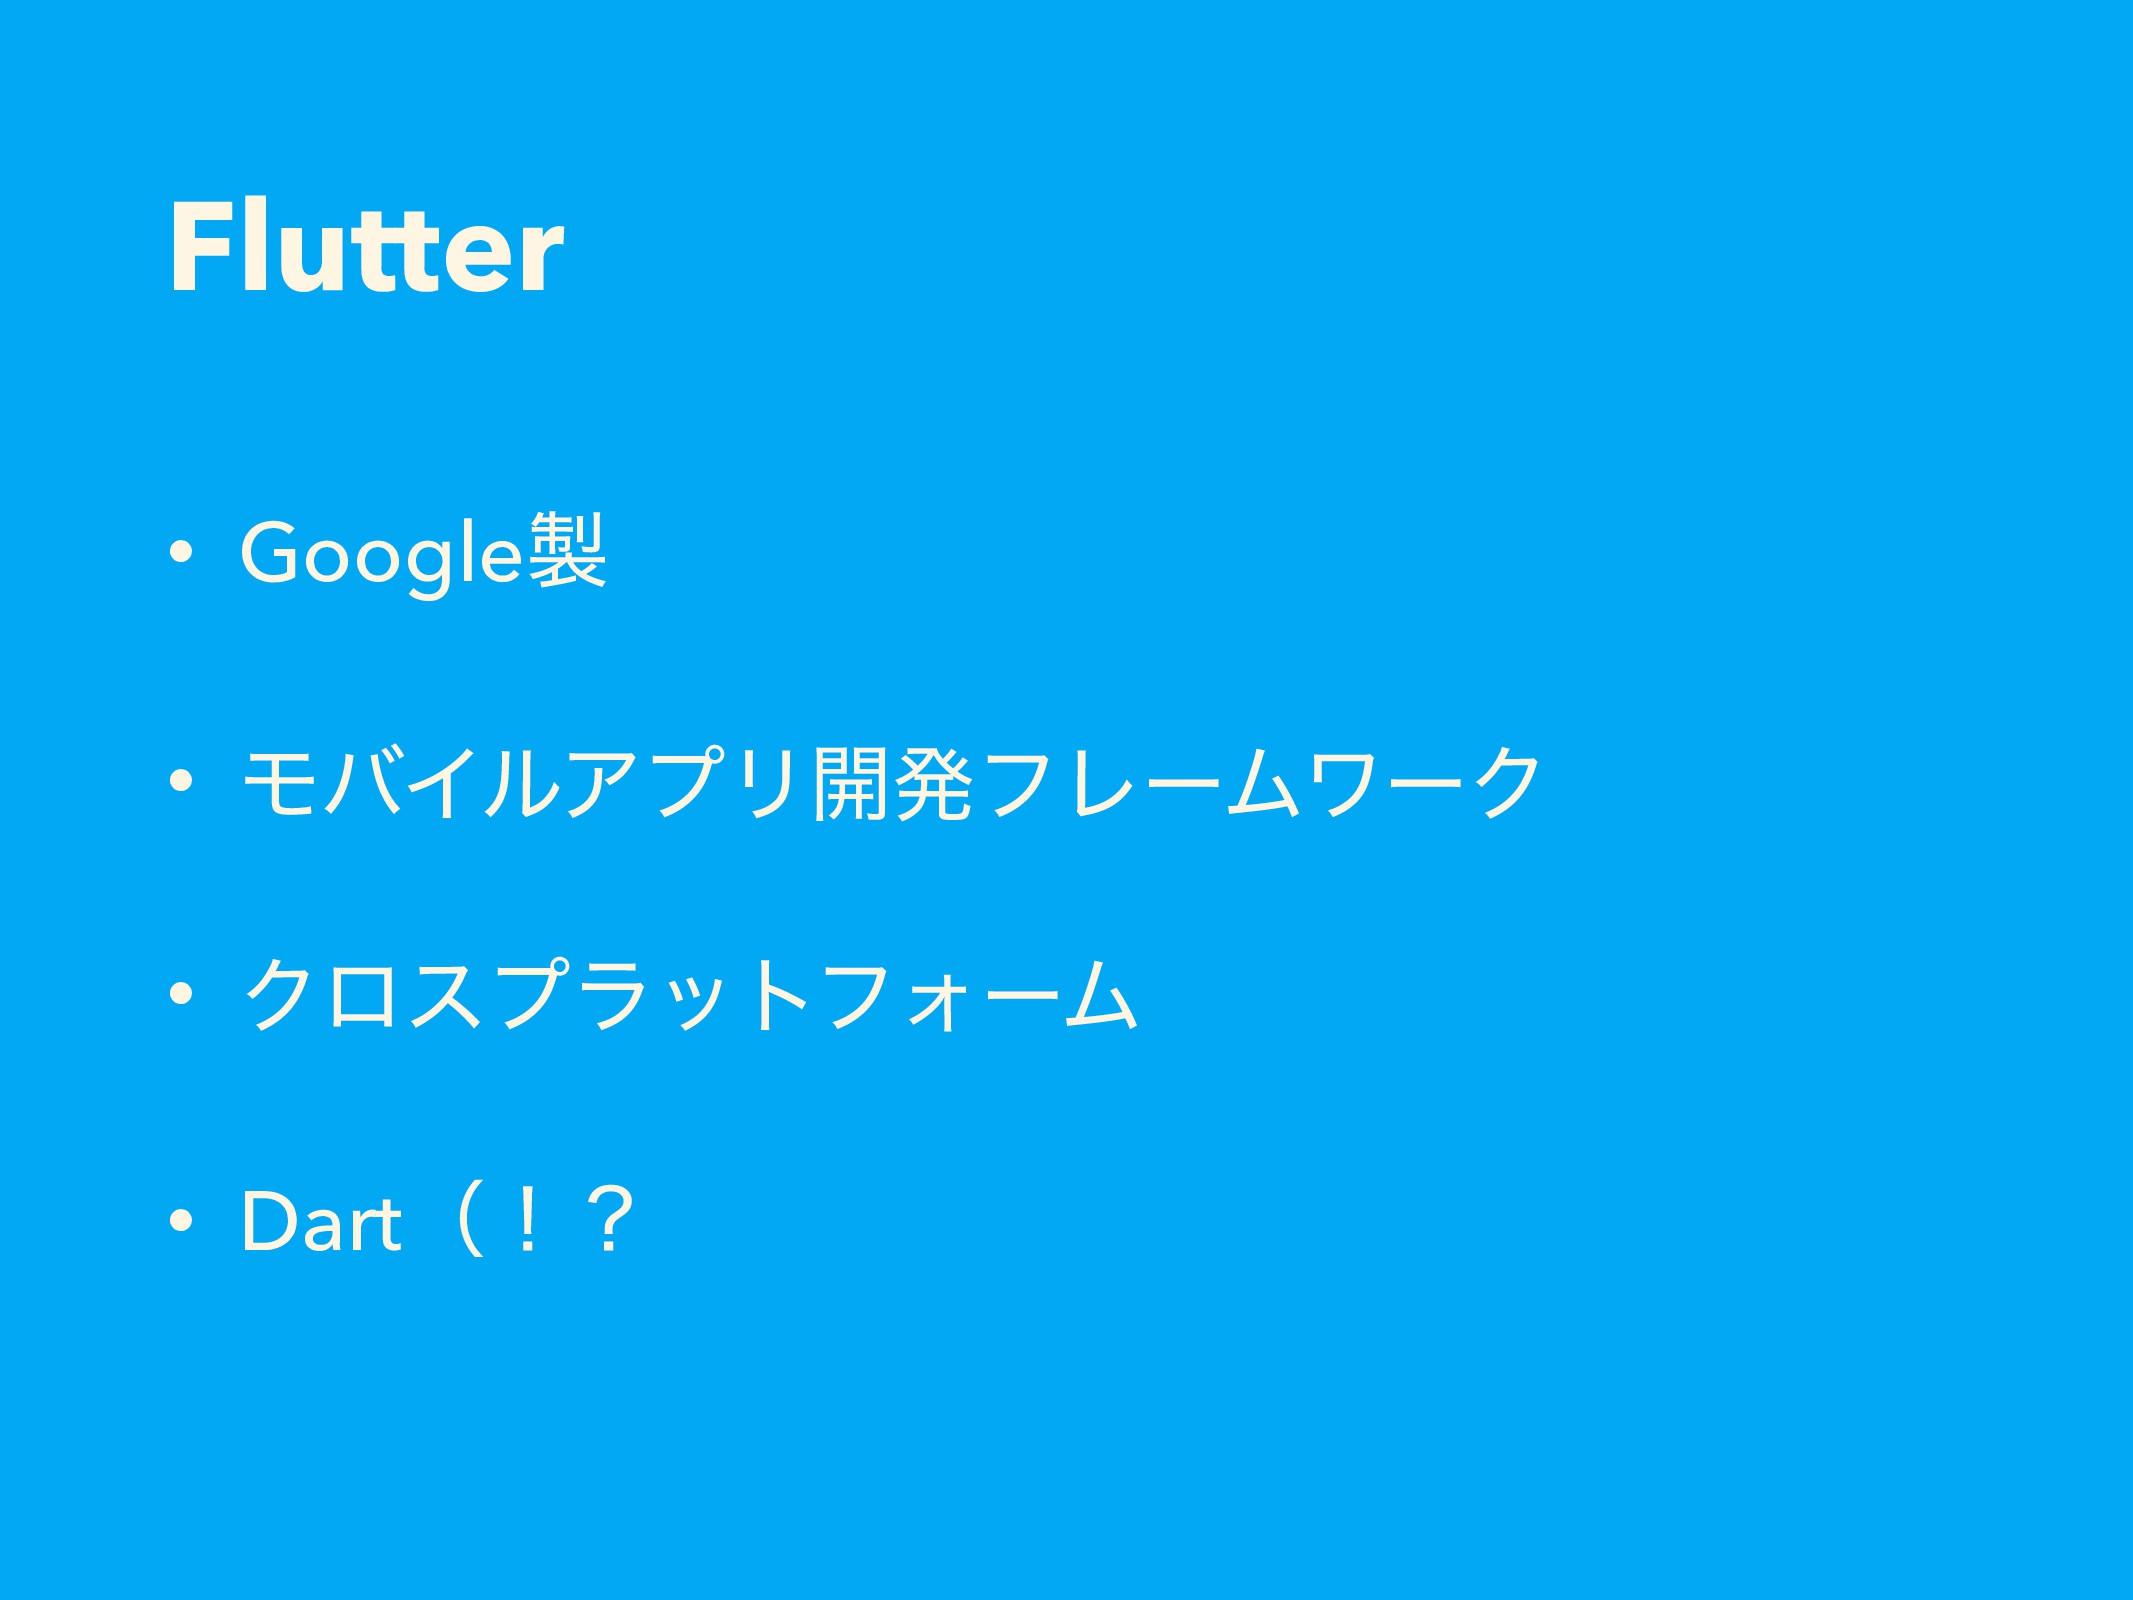 Flutter • Google • ϞόΠϧΞϓϦ։ൃϑϨʔϜϫʔΫ • Ϋϩεϓϥοτϑ...